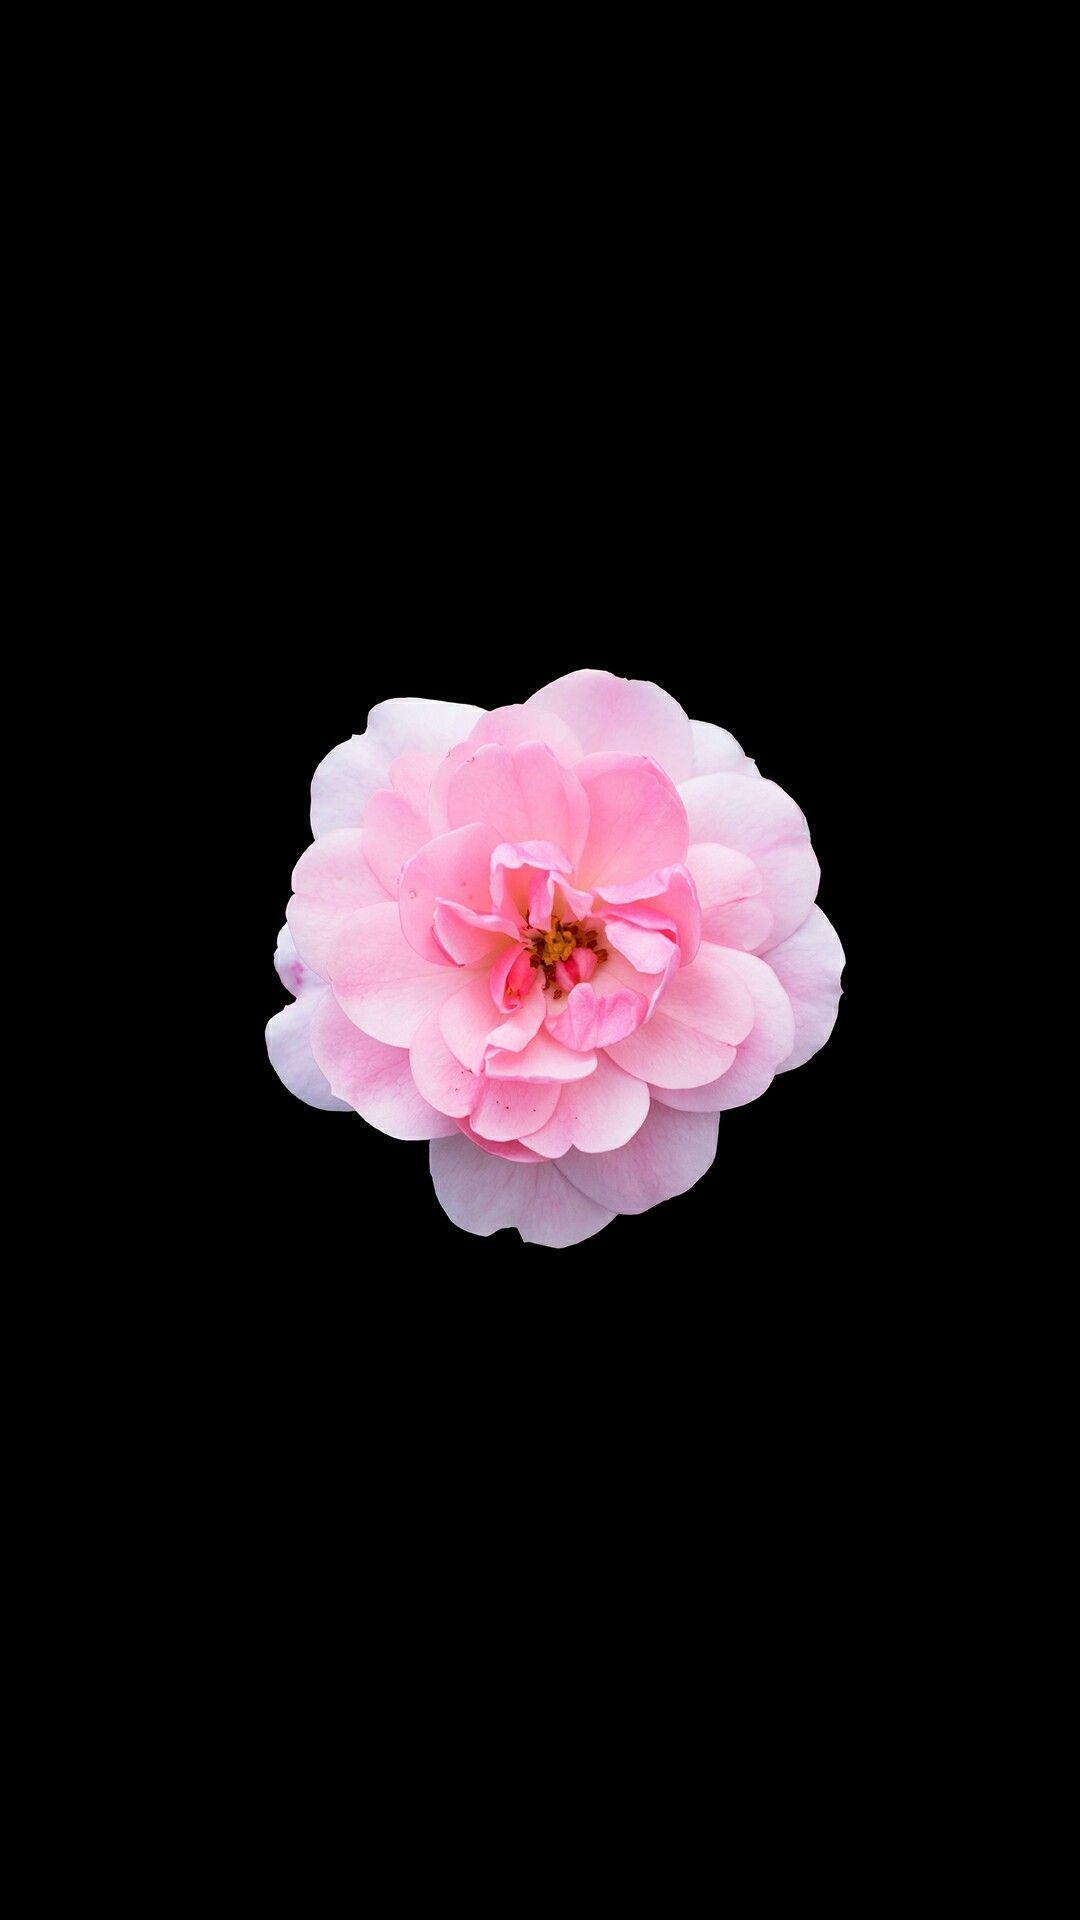 Single Flower Pink Iphone Wallpaper Pink Wallpaper Iphone Flower Iphone Wallpaper Pink Flowers Wallpaper